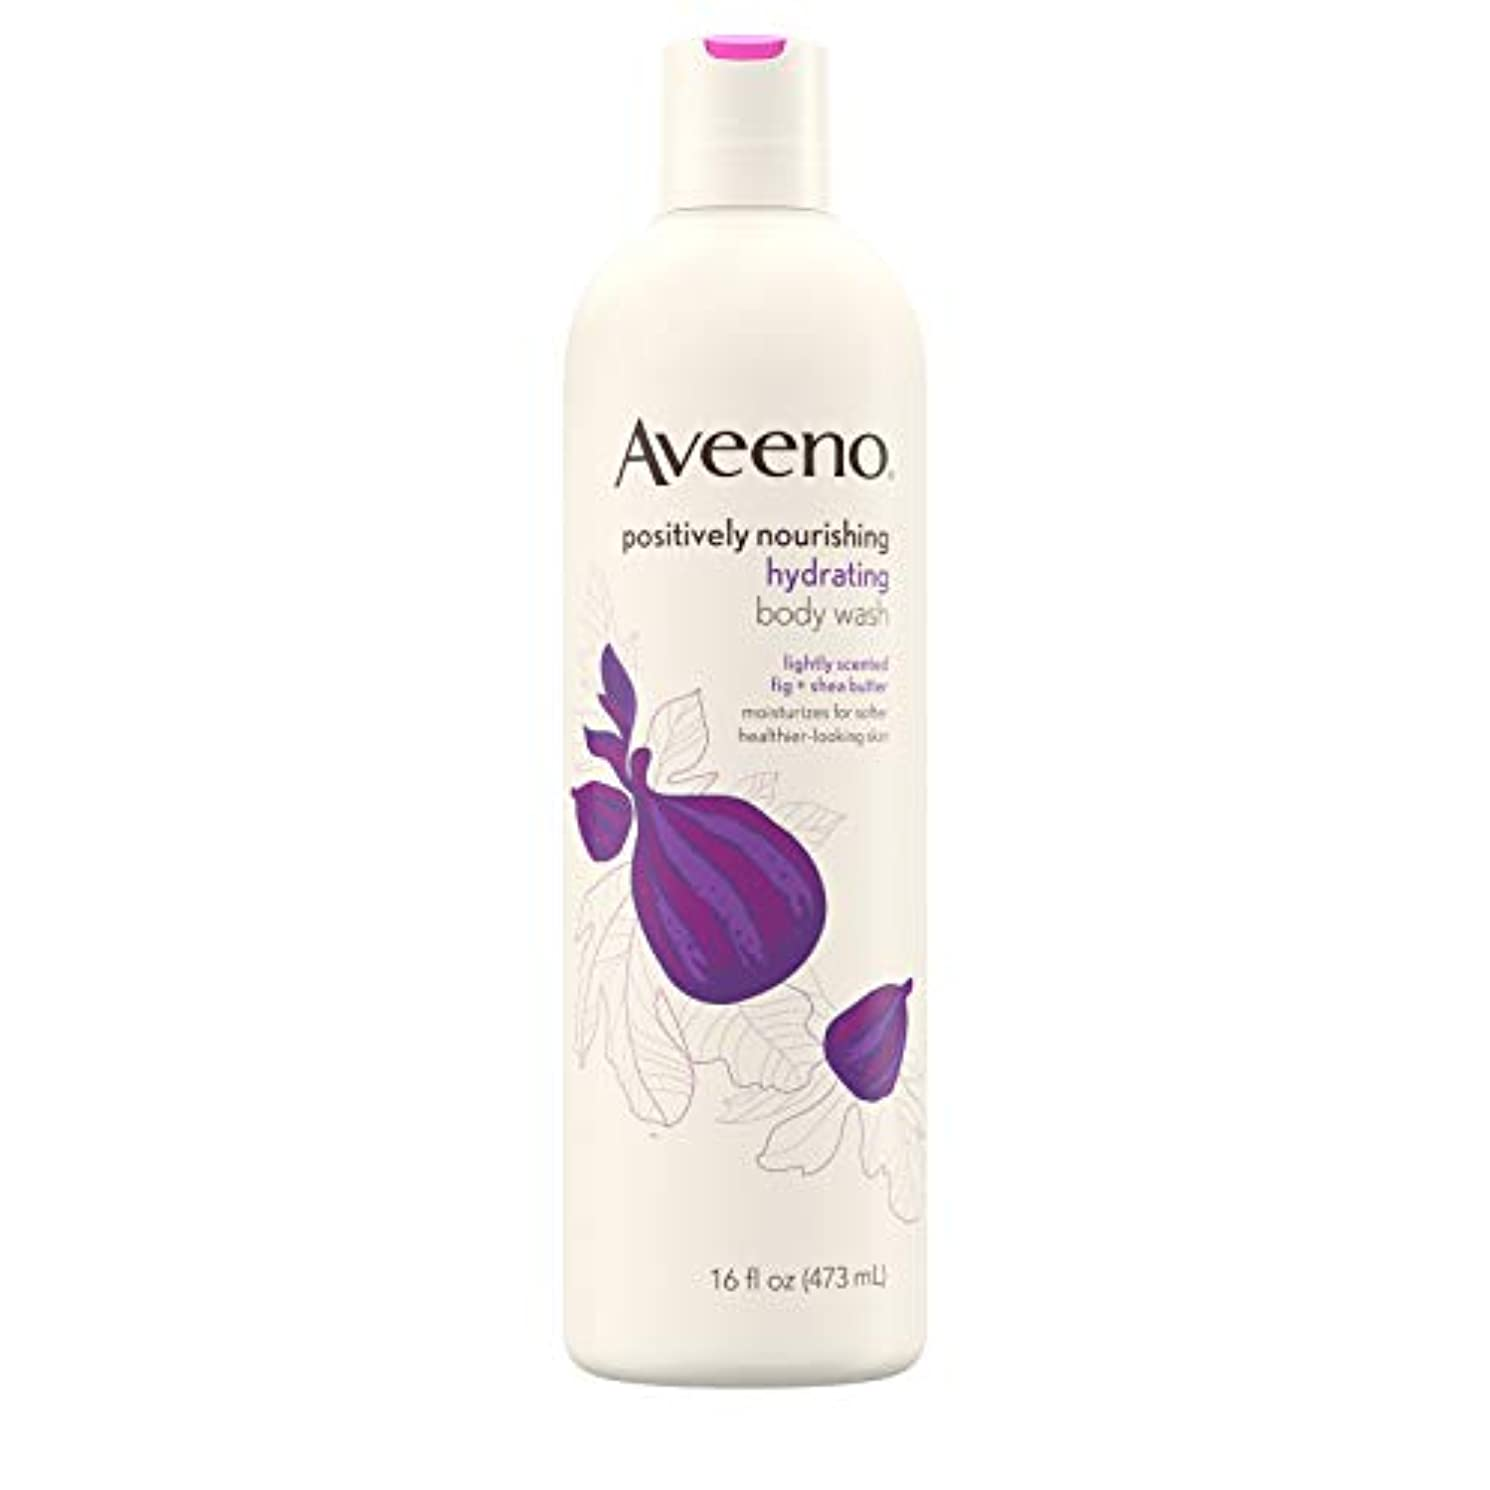 New Aveeno Positively Nourishing New Aveeno Ultra Hydrating Body Wash, 470ml